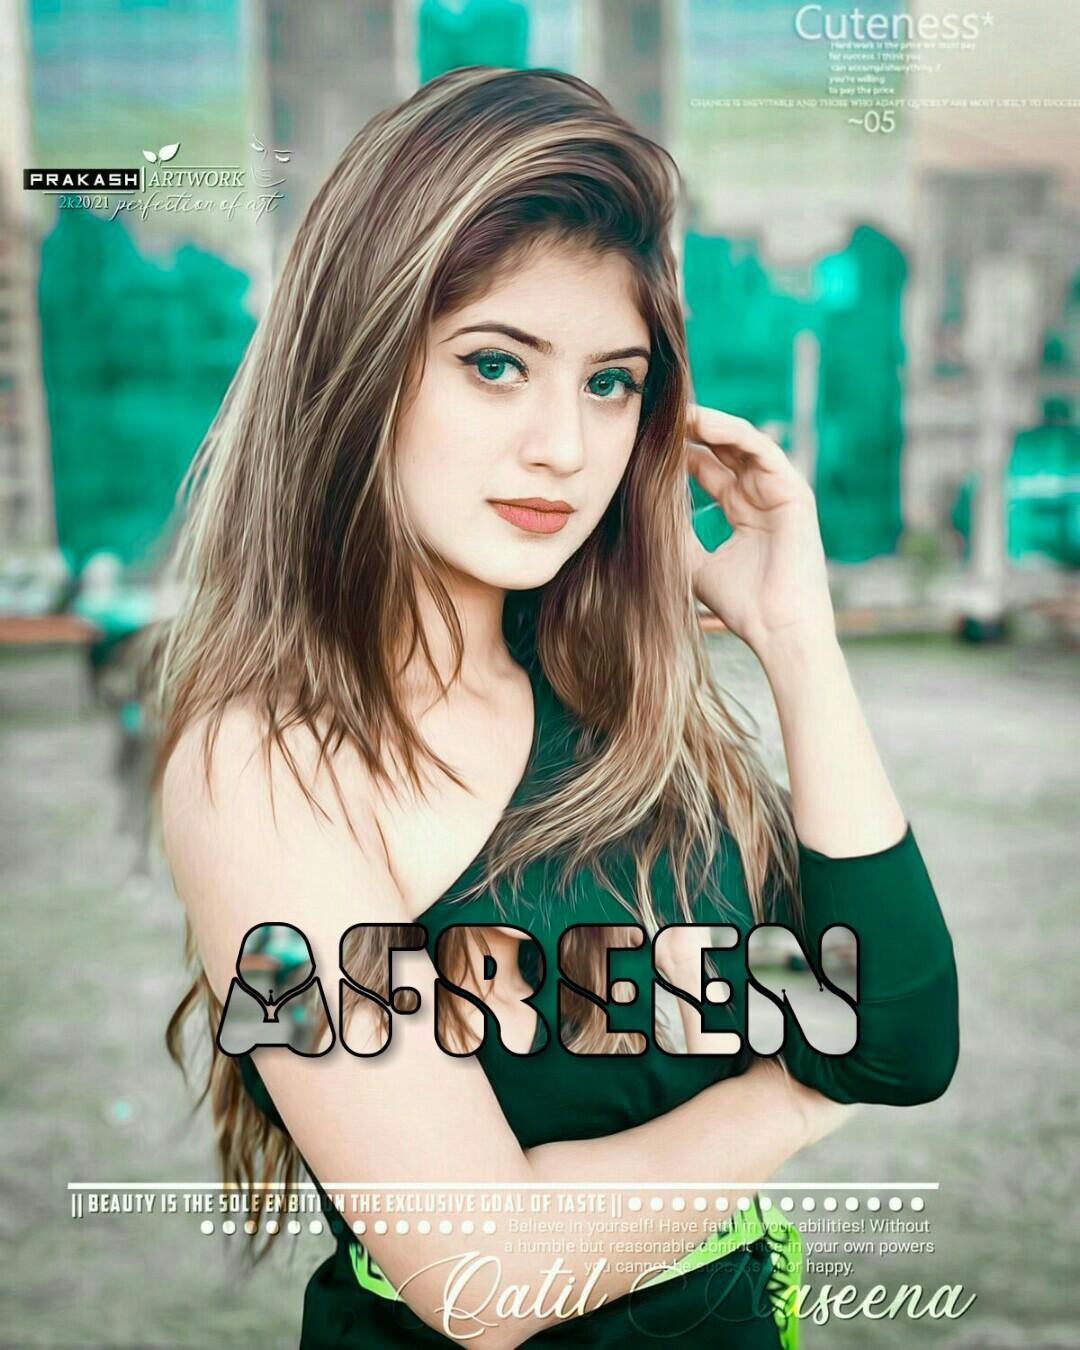 Afreen Name Whatsapp Dp And Wallpaper